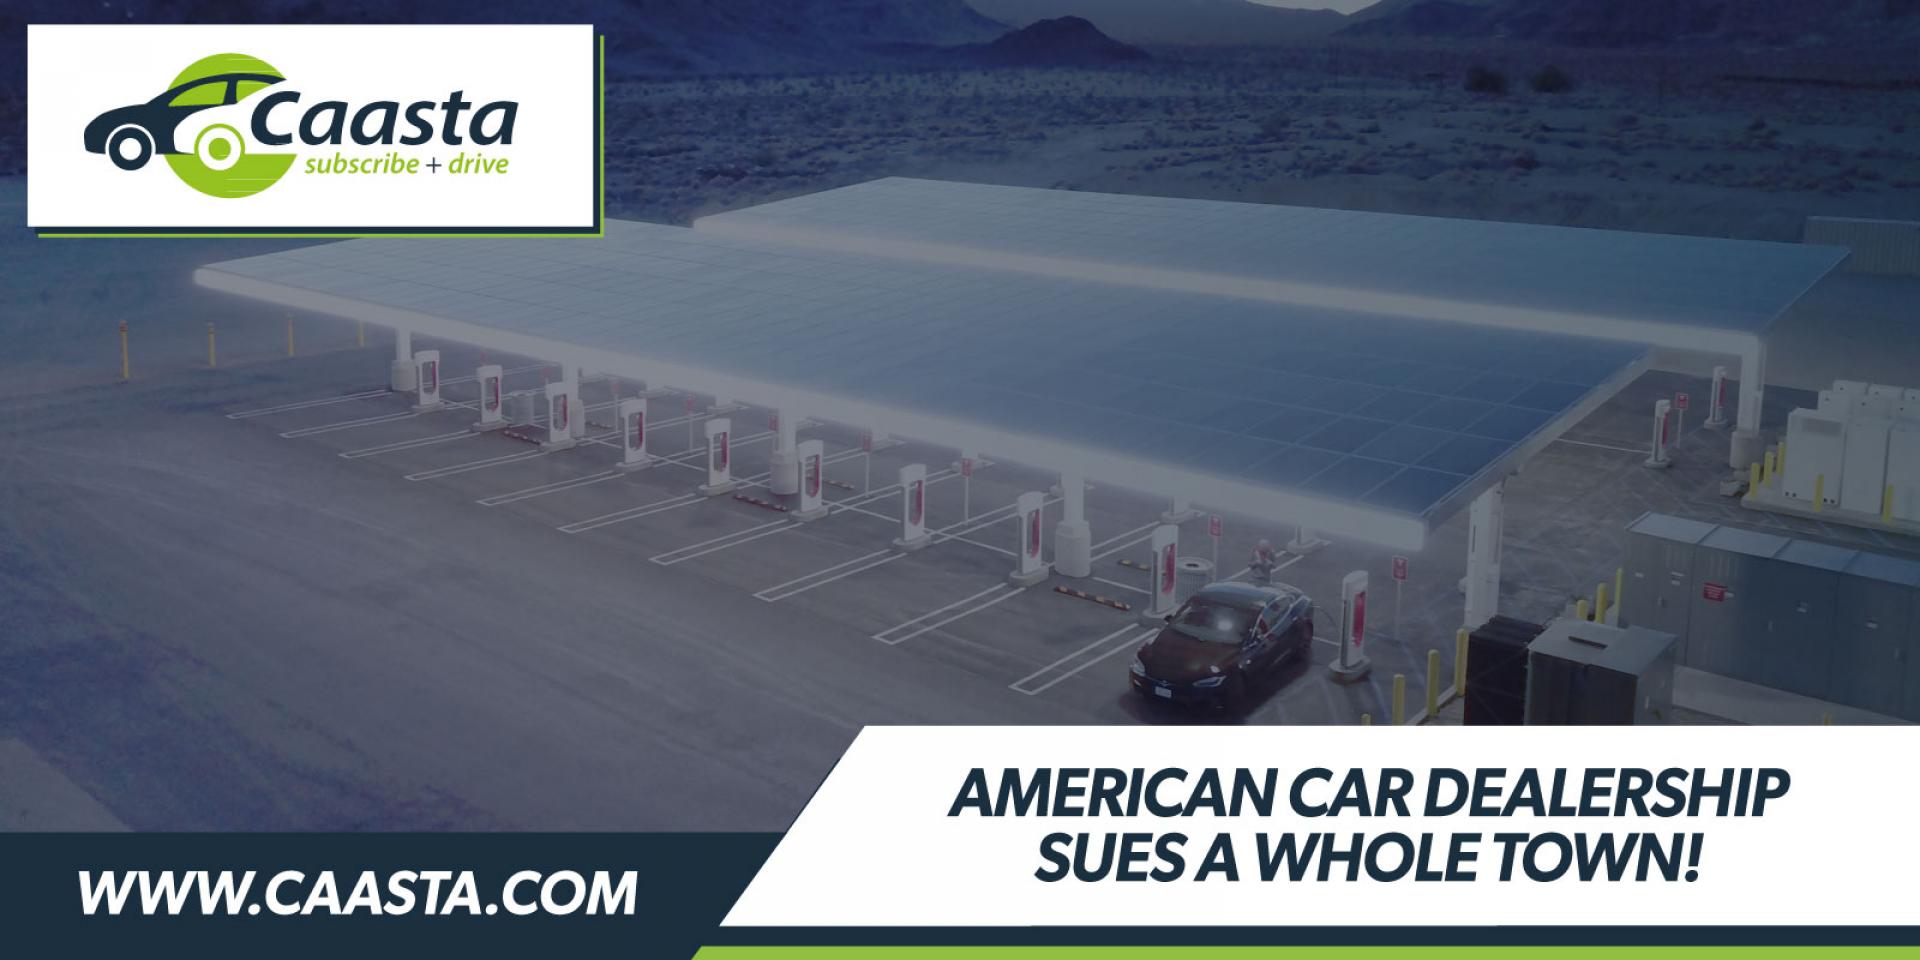 American car dealership sues whole town in bid to prevent Tesla showroom